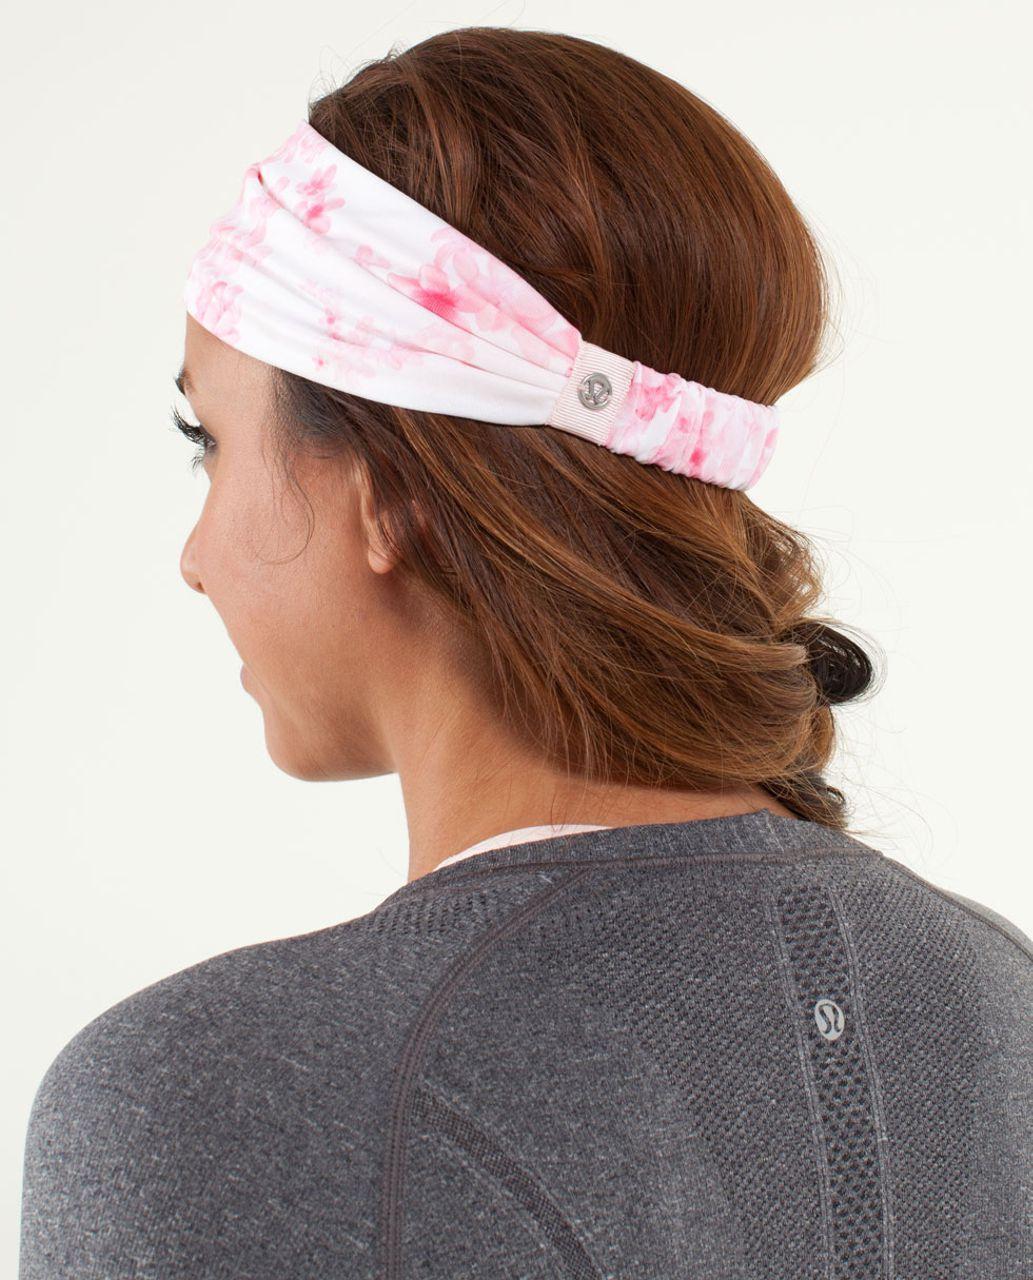 Lululemon Bang Buster Headband *Reversible - Frangipani Parfait Pink / Parfait Pink